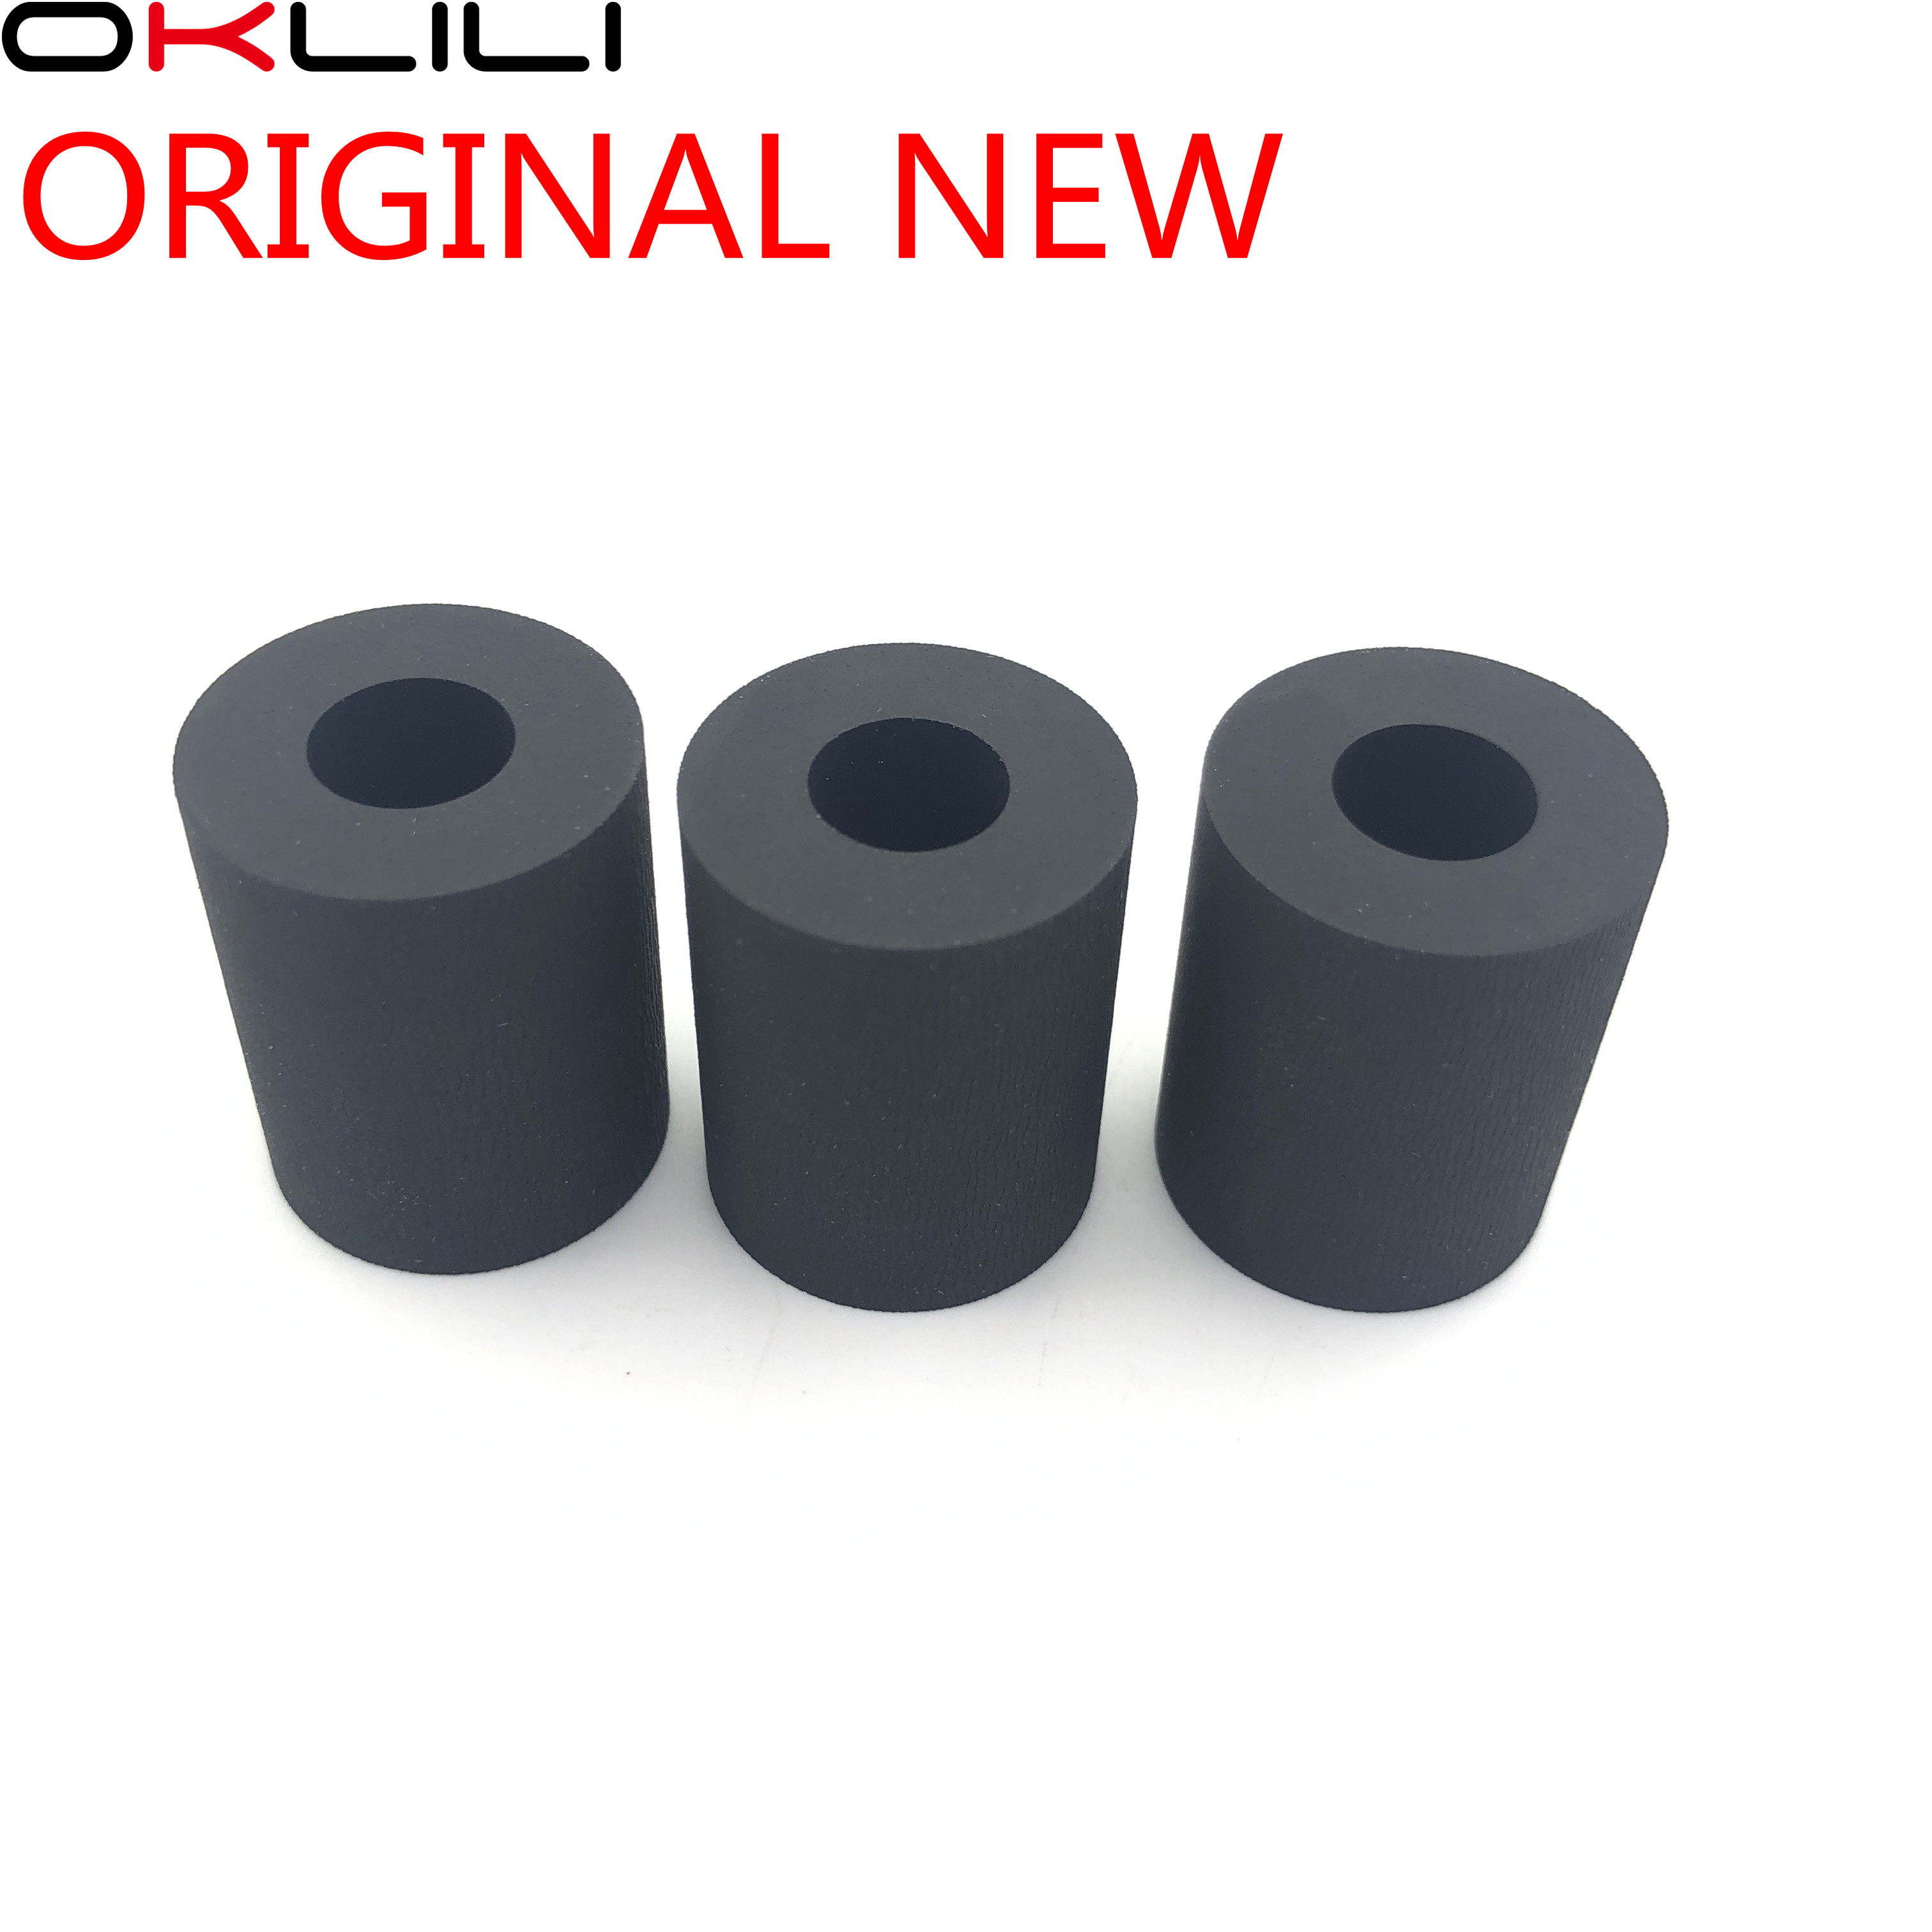 2br06520 compatible - 2BR06520 2F906240 2F906230 Pickup Roller tire Pickup rubber for Kyocera FS1028 1035 1100 1120 1128 1300 1320 1370 2000 3900 4000